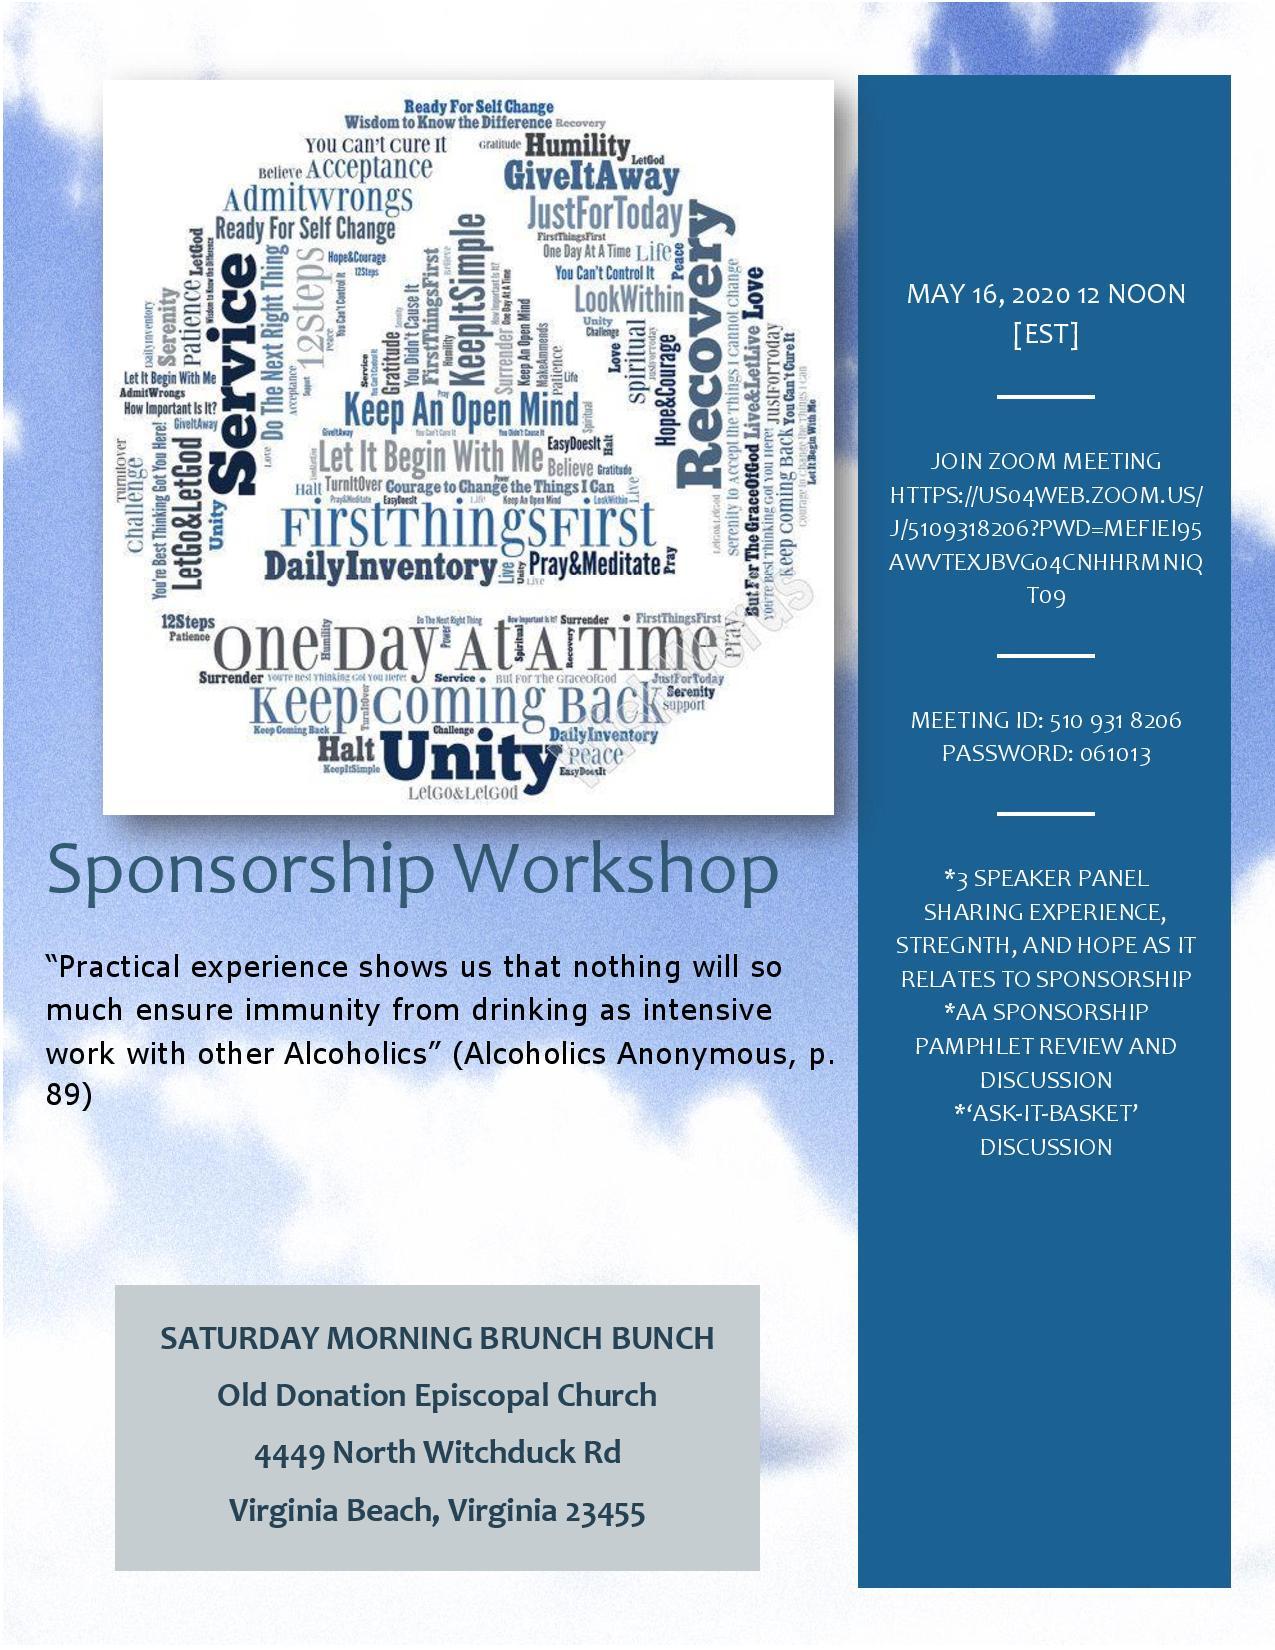 Sponsorship Workshop • Tidewater Intergroup Council